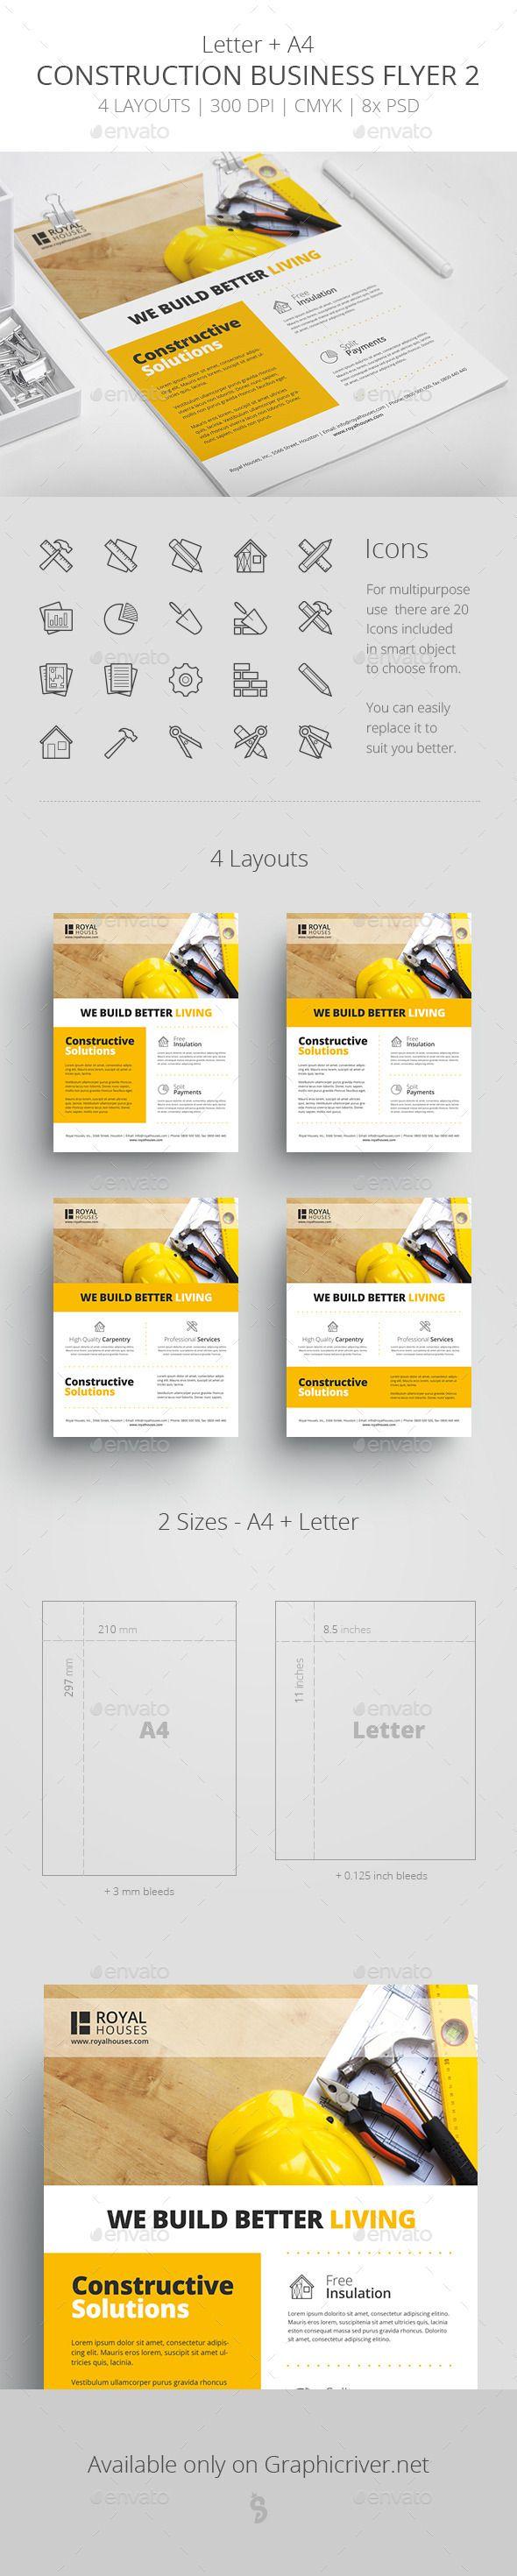 Construction Business Flyer 2 - Letter + A4